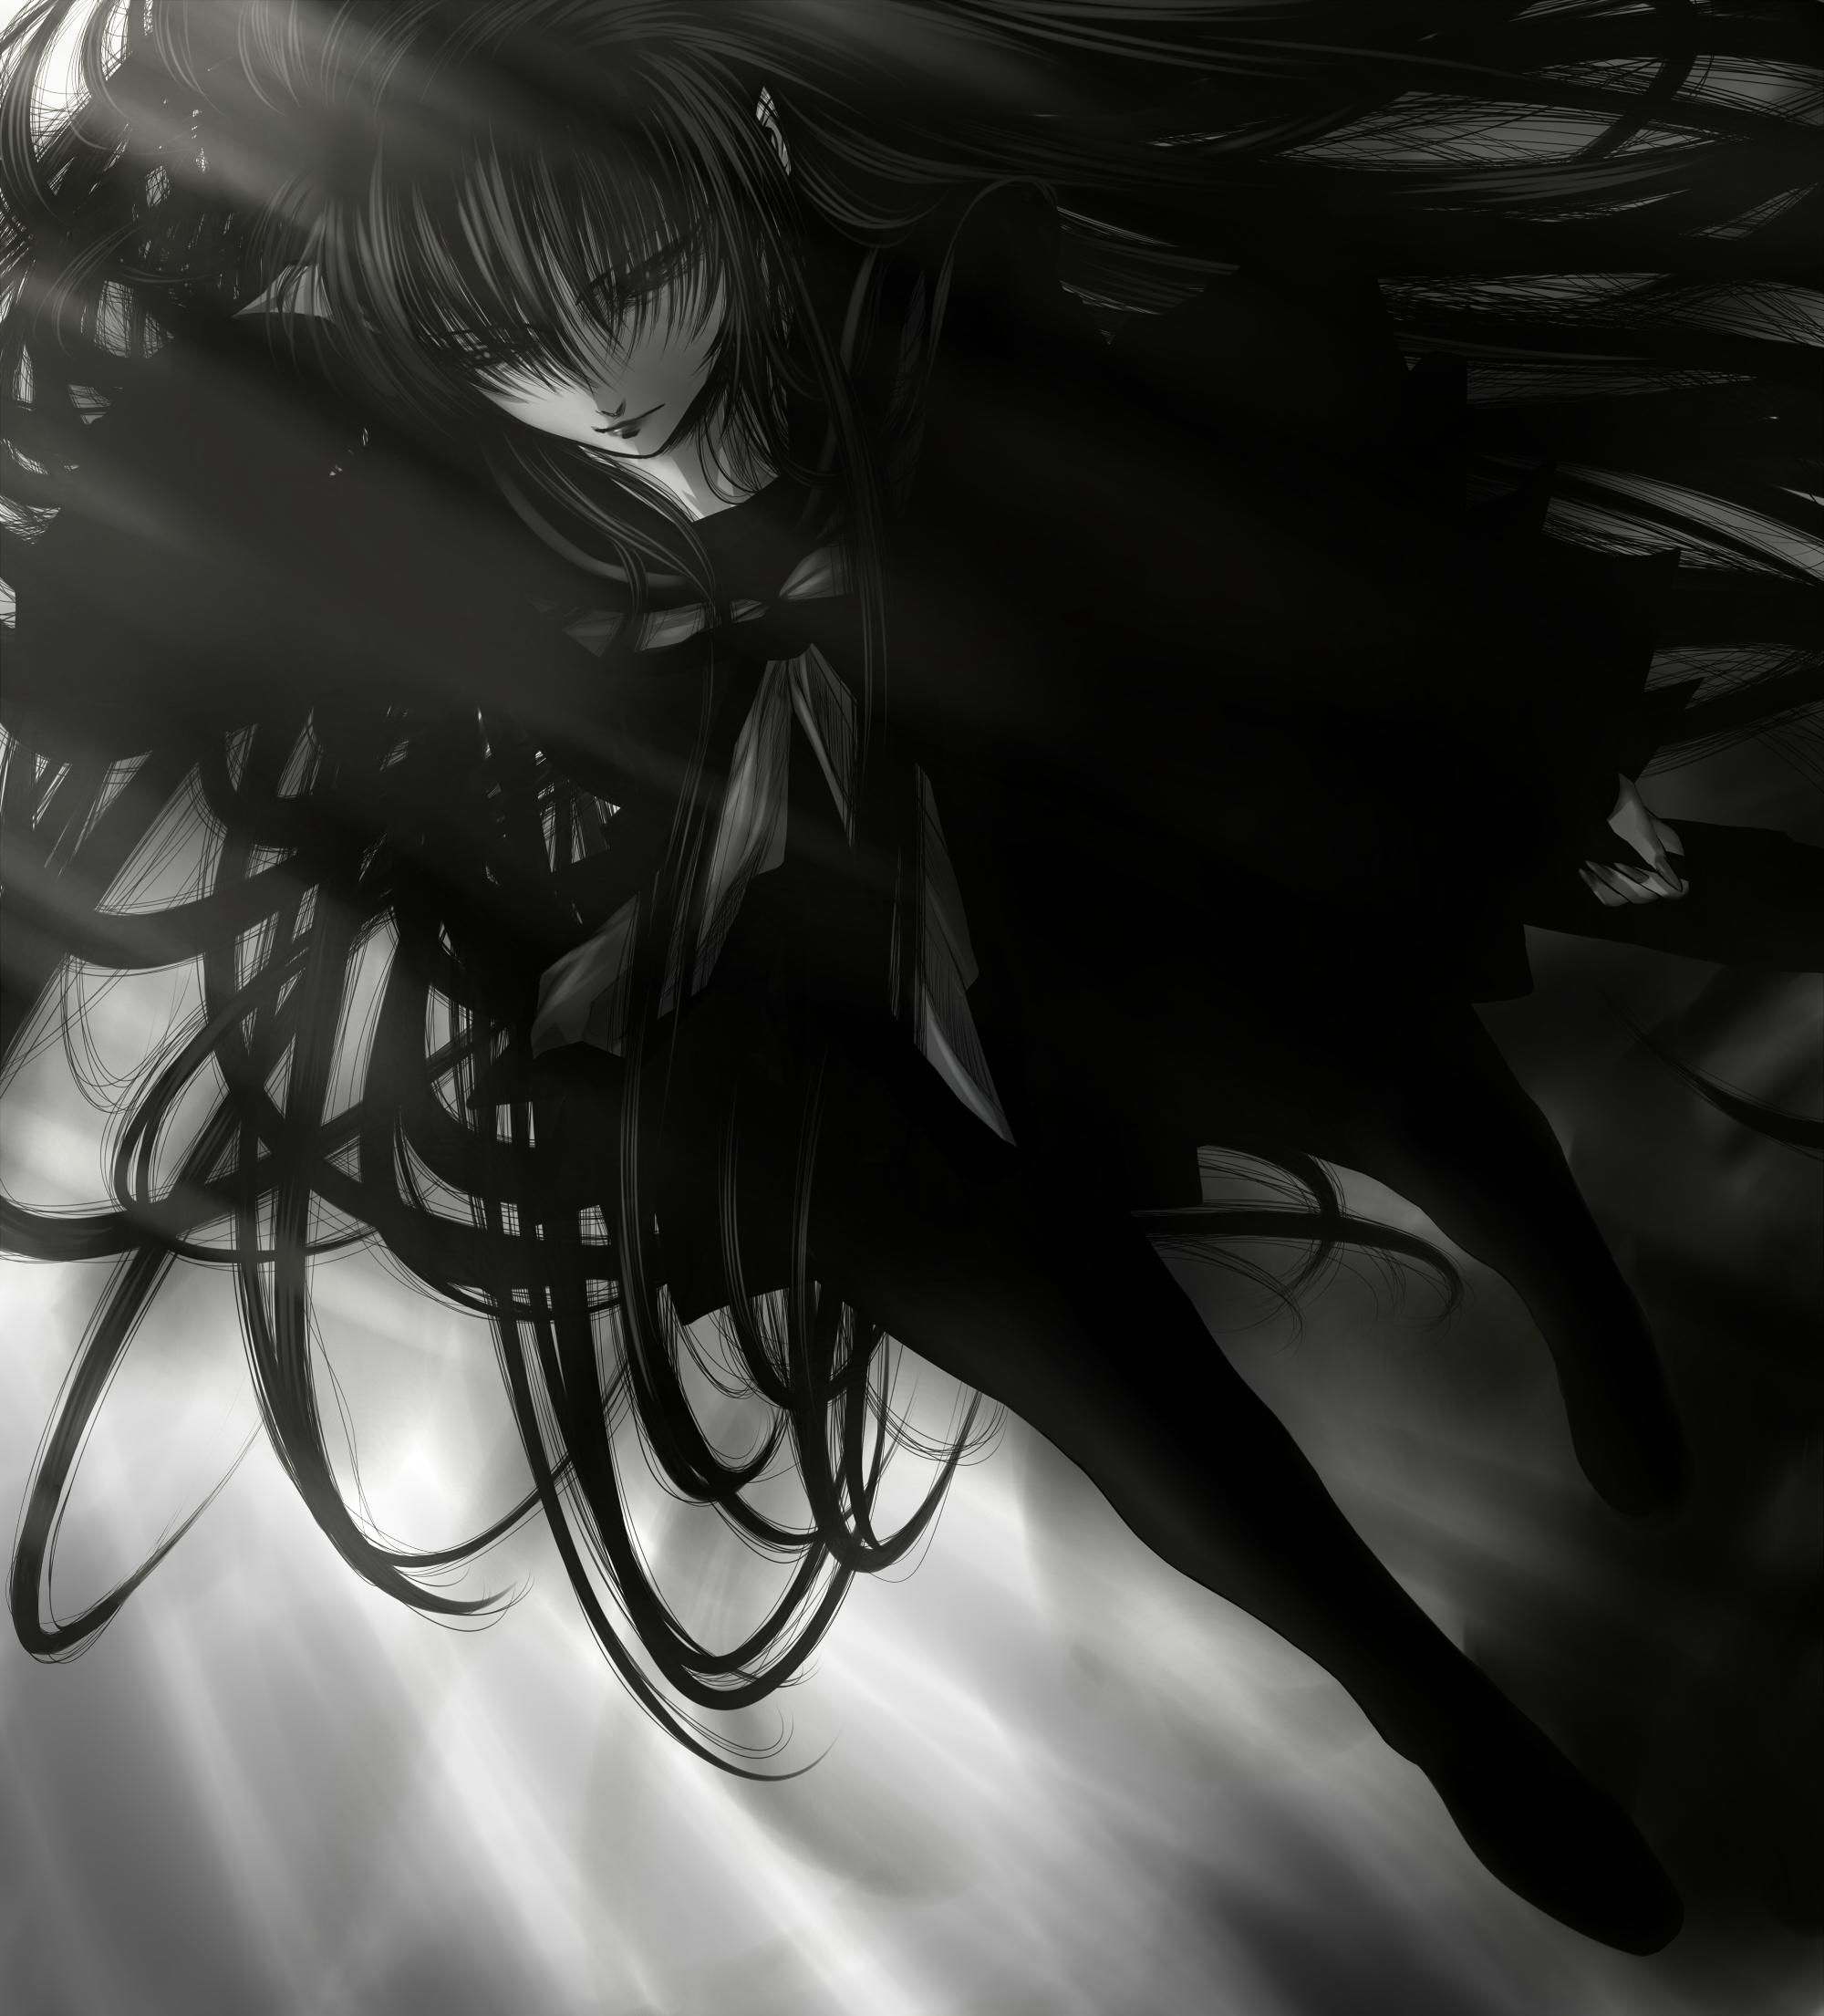 Hagoromo Kitsune - Nurarihyon no Mago - Zerochan Anime Image Board